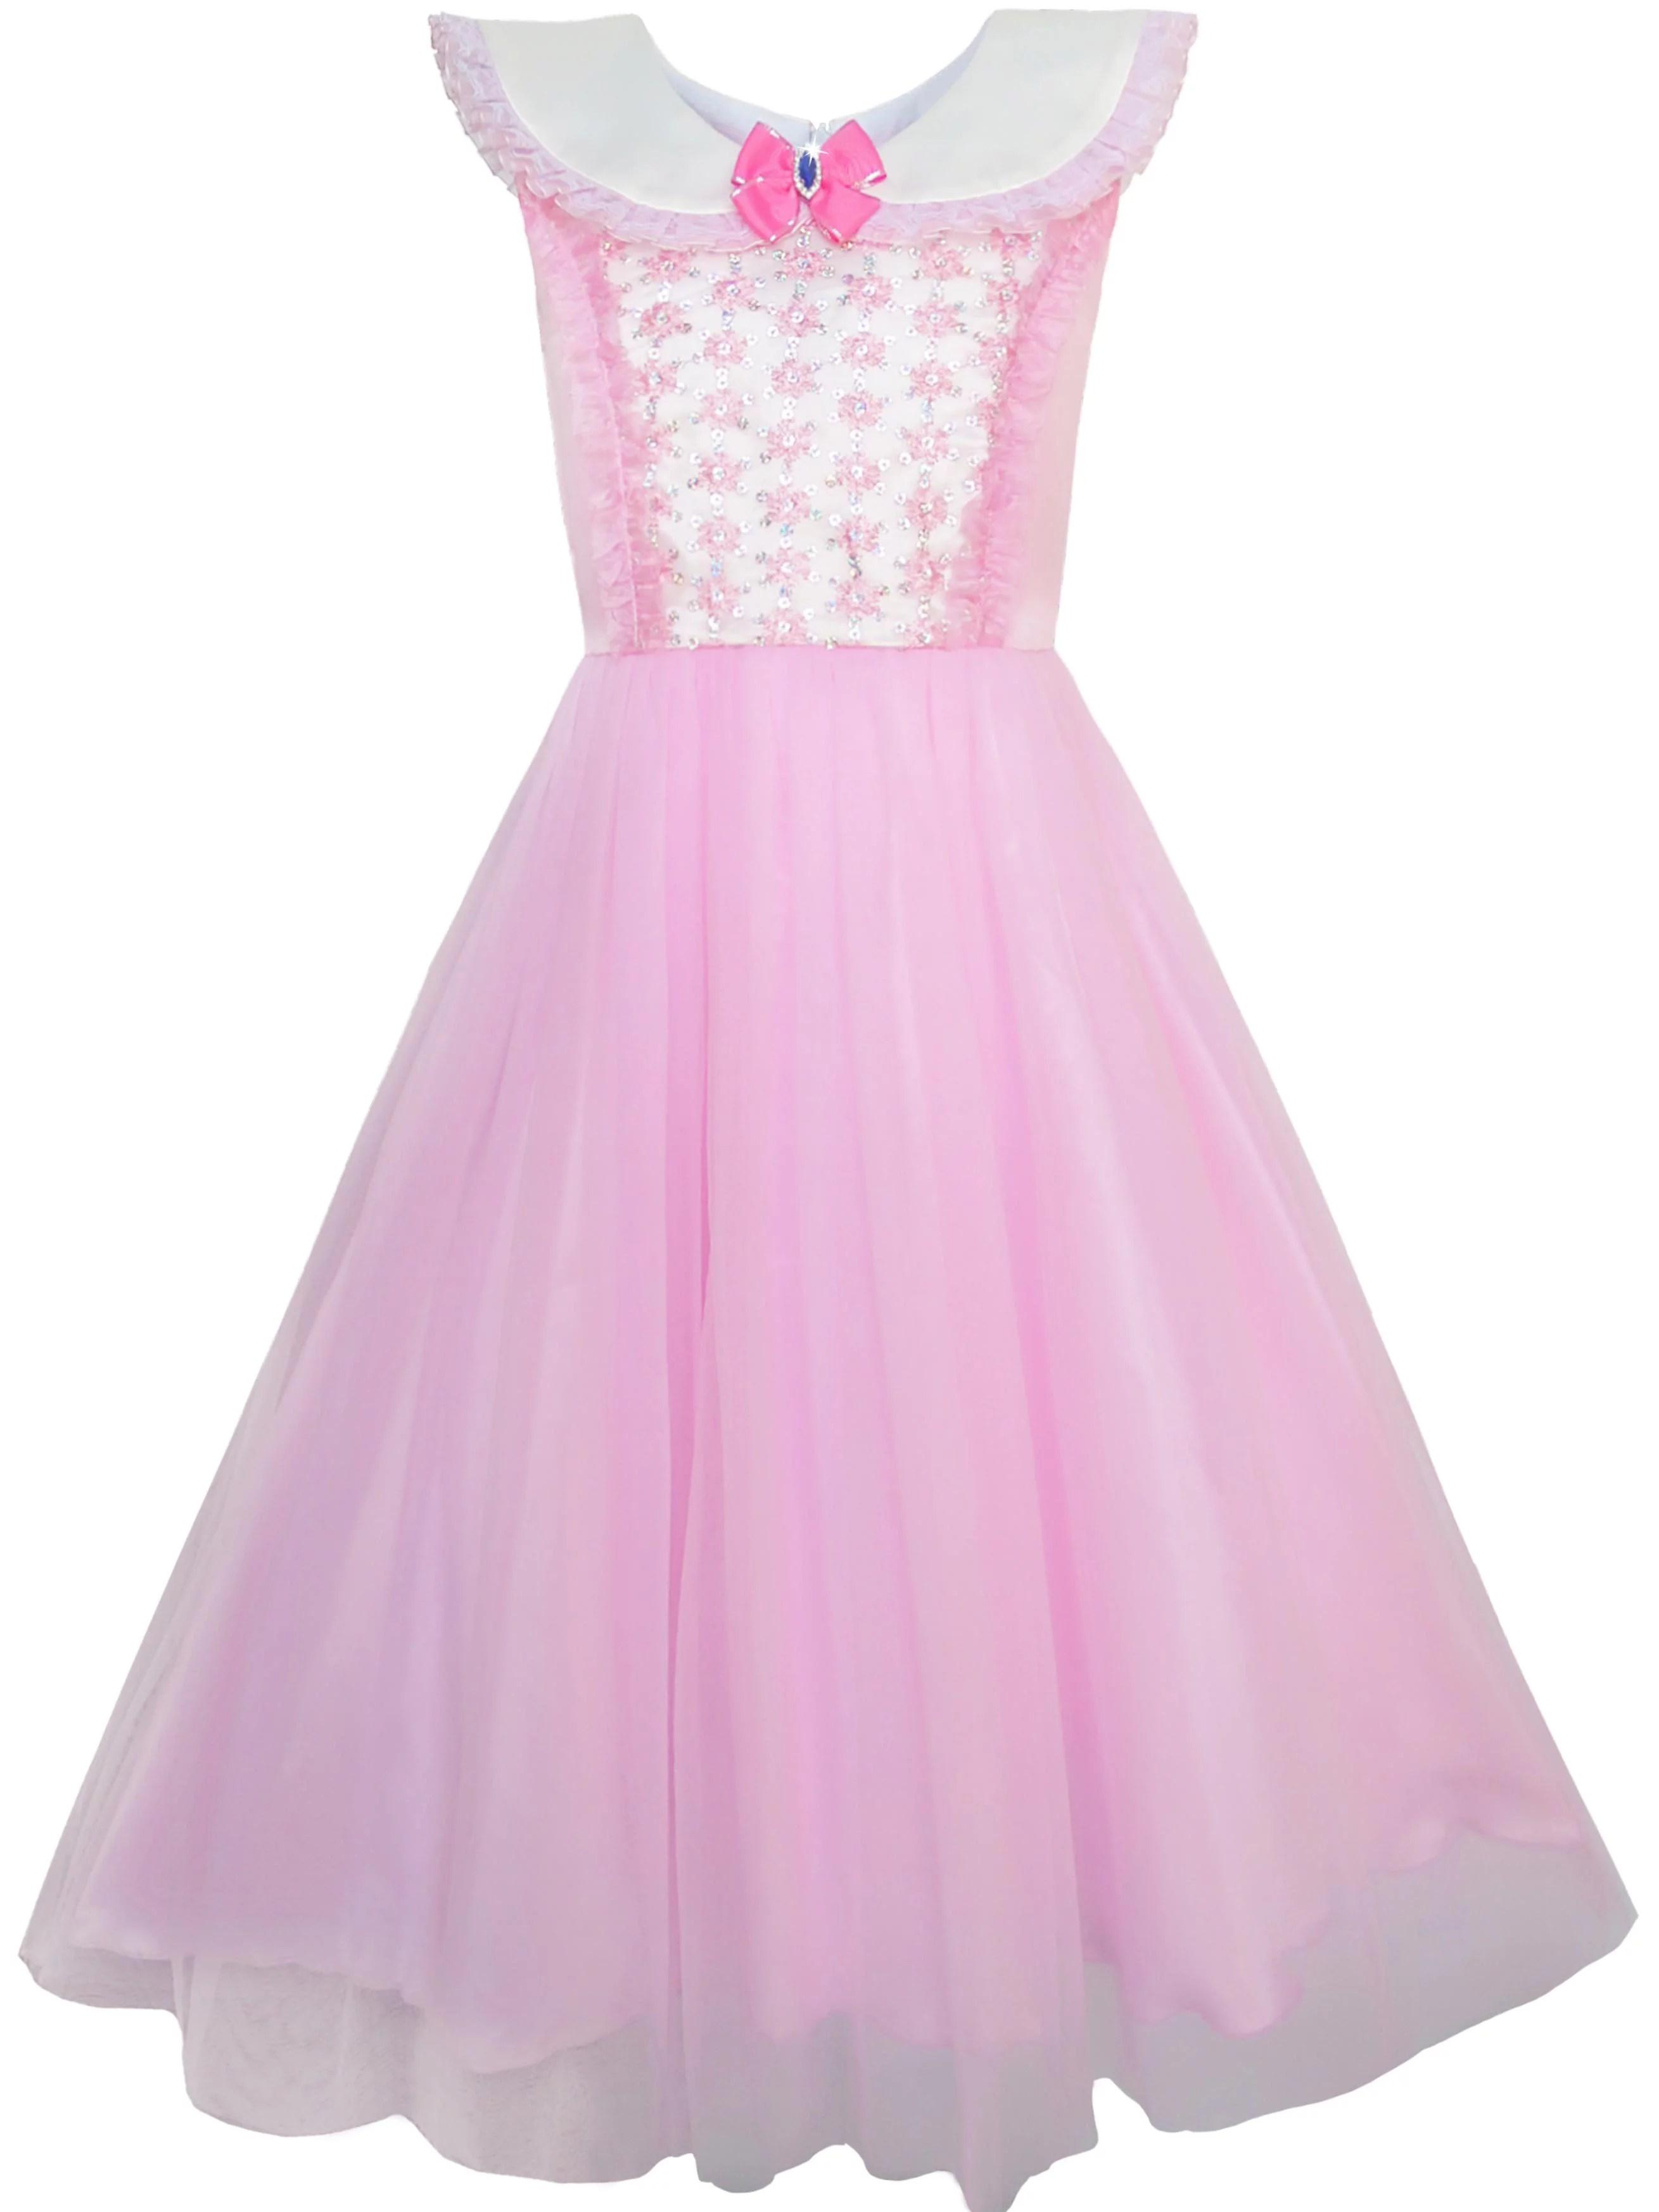 Girls Dress Pink Princess Costume Cinderella Fancy Birthday Ball 7 Years Walmart Canada